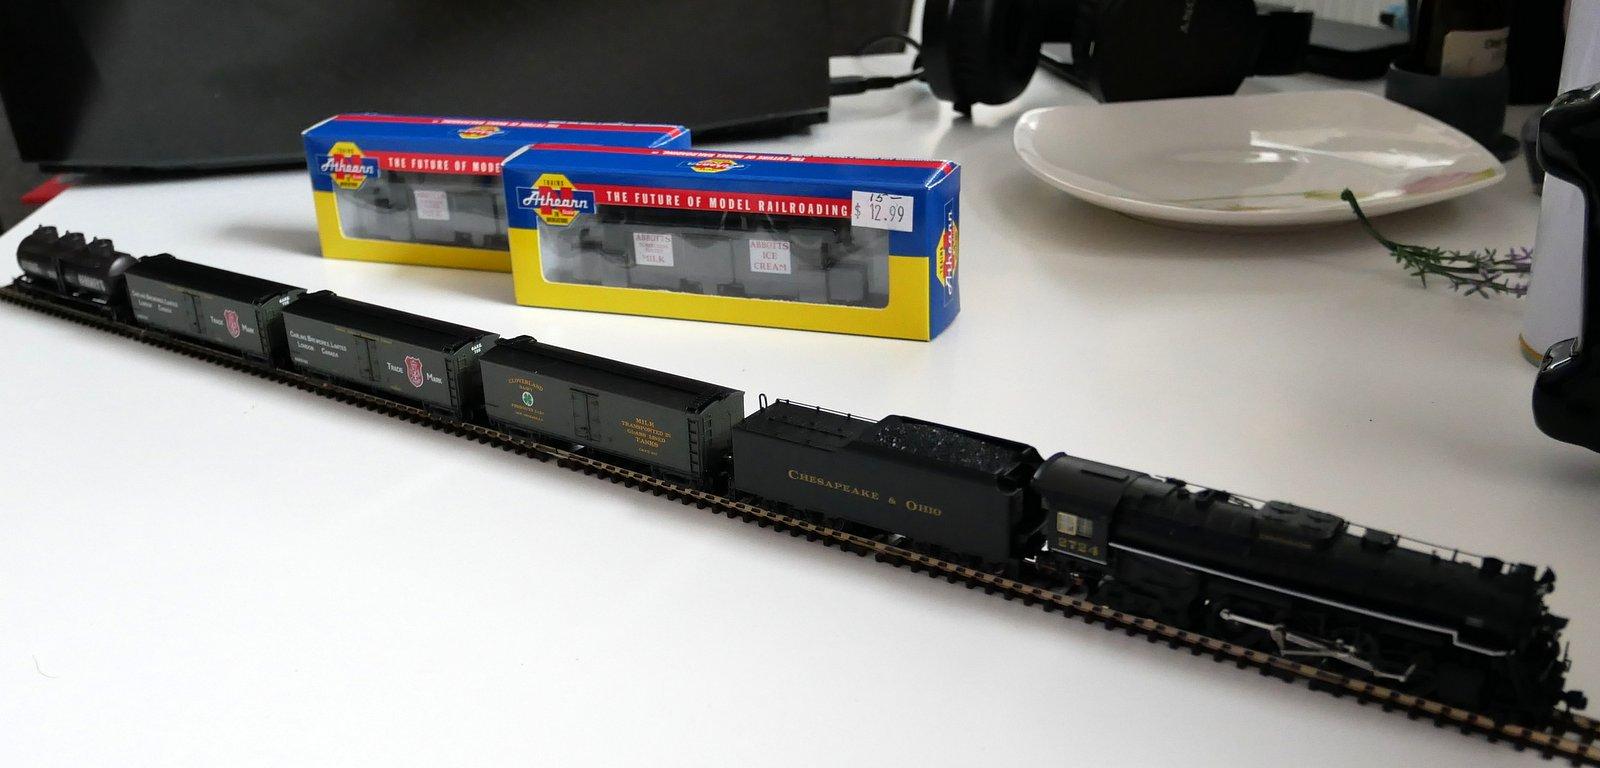 P1180789-001.JPG